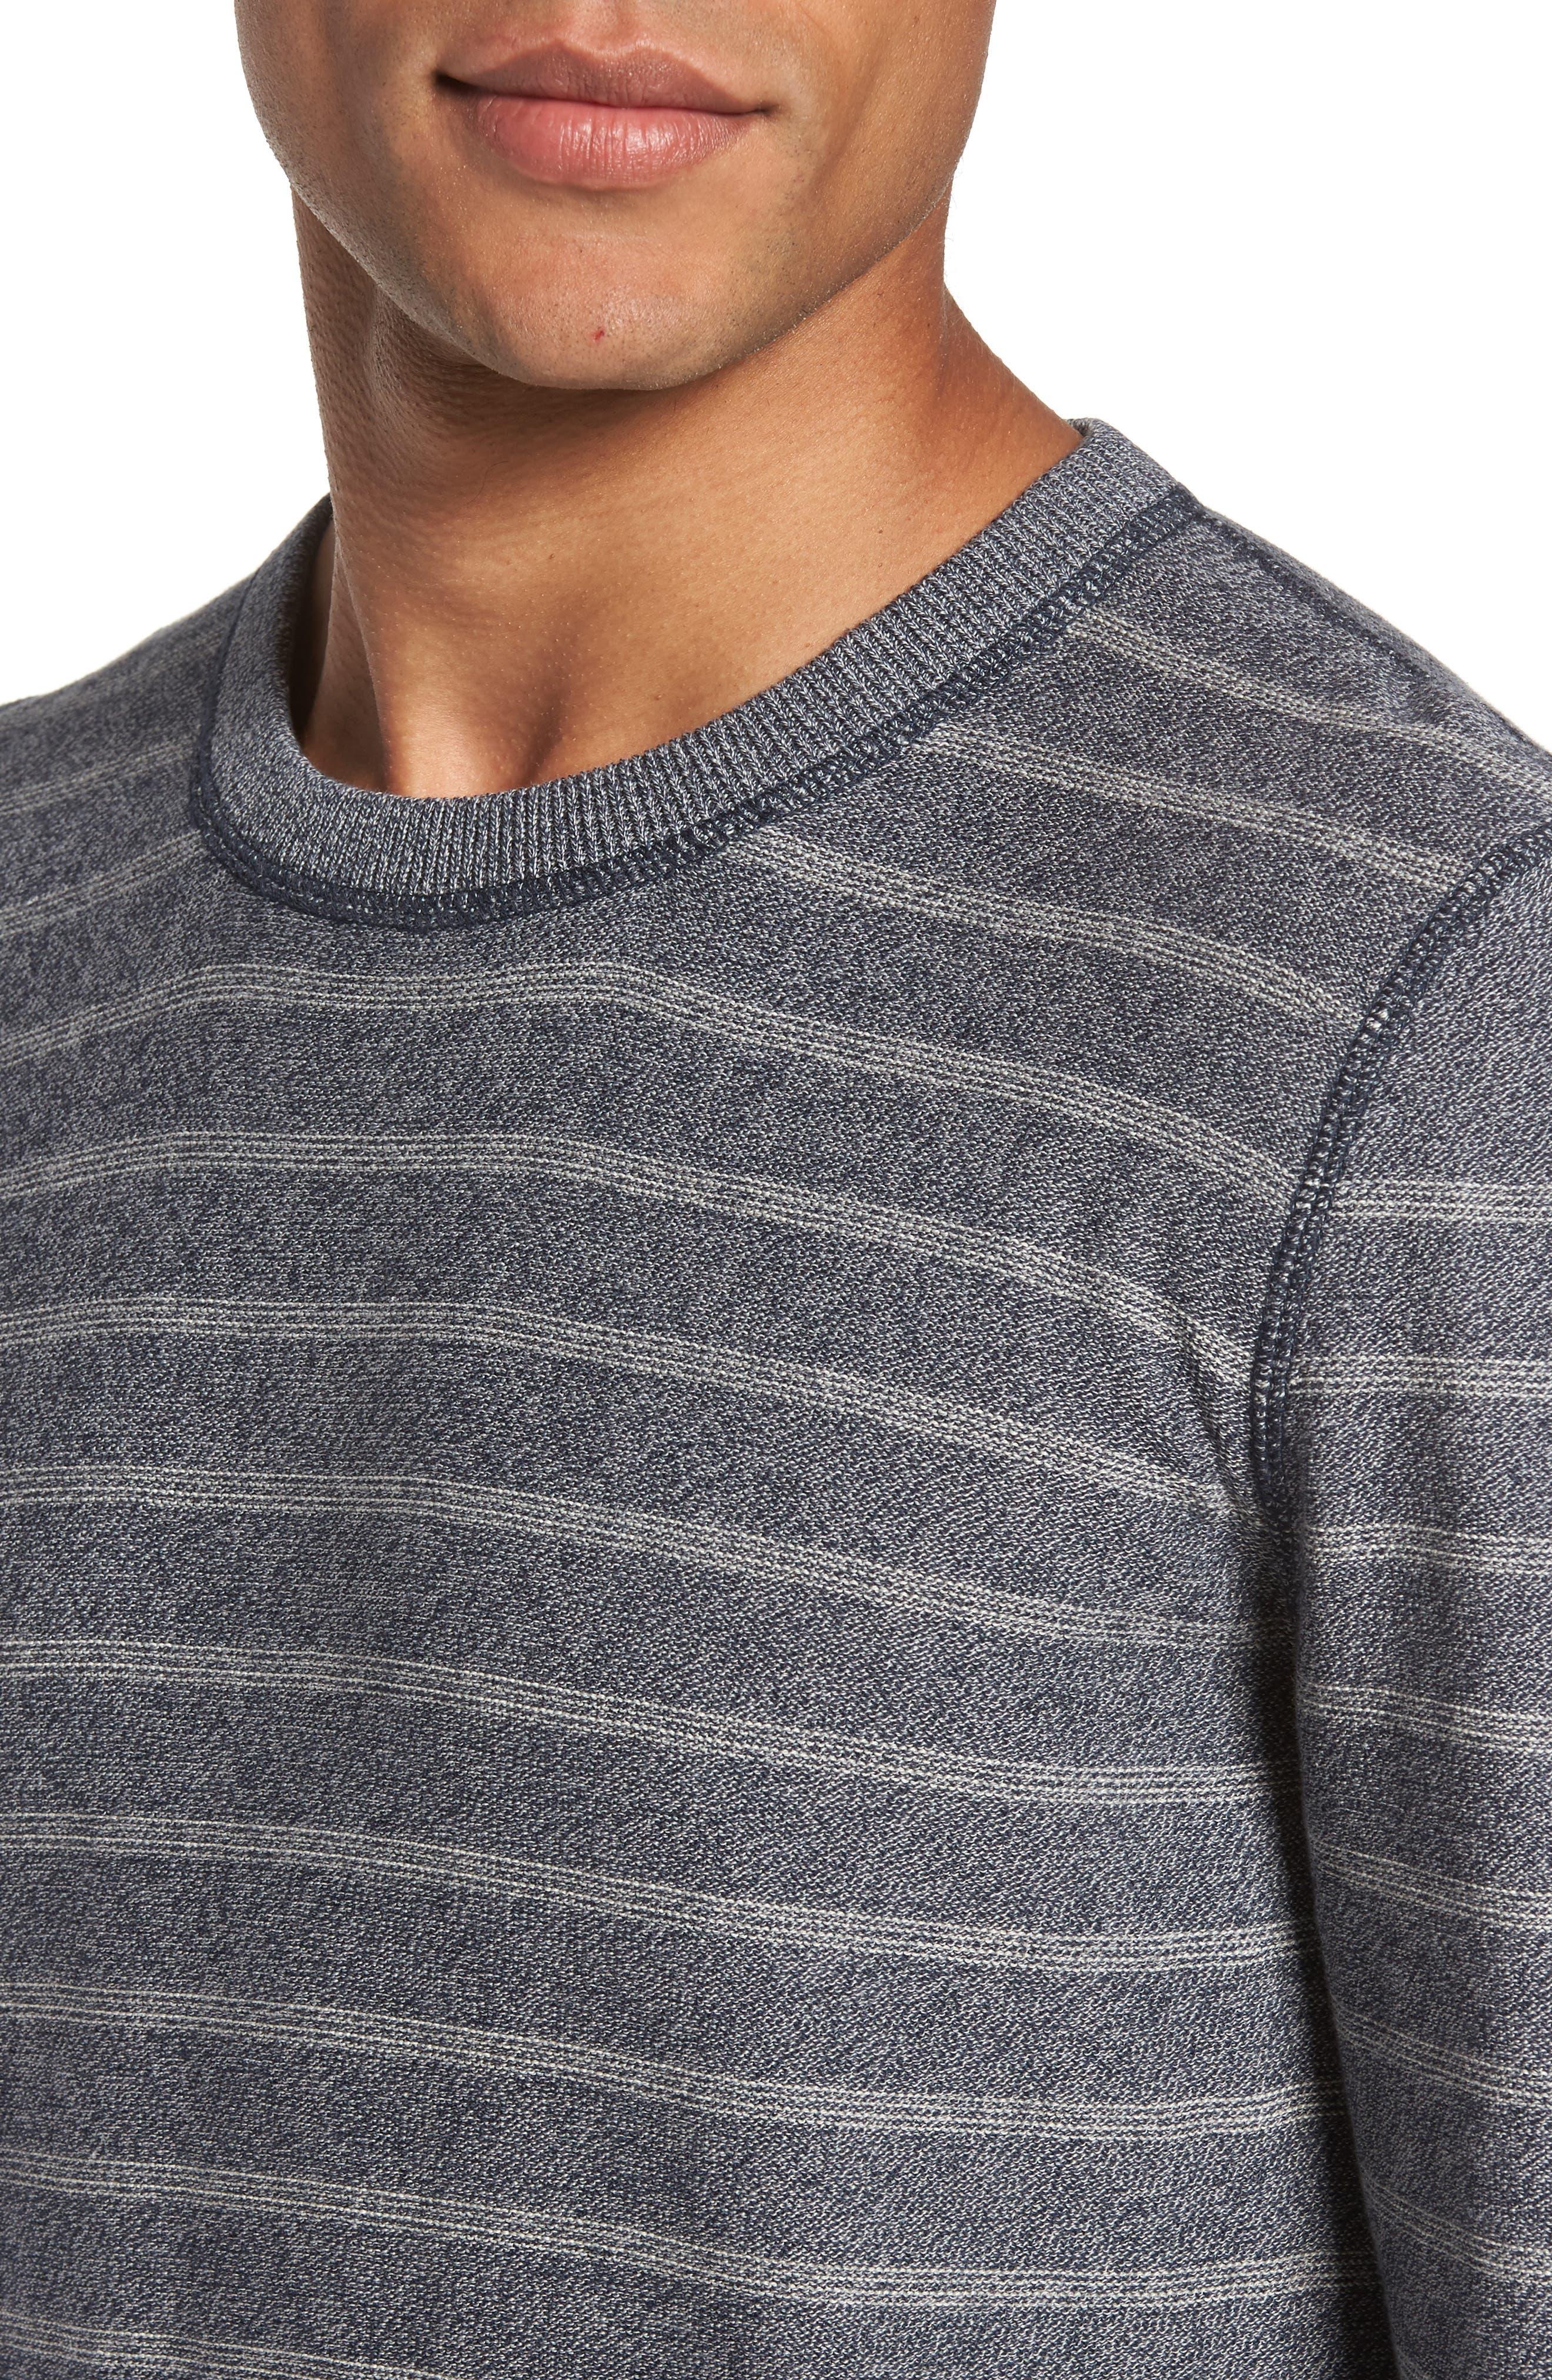 Tanner Crewneck Sweatshirt,                             Alternate thumbnail 4, color,                             021